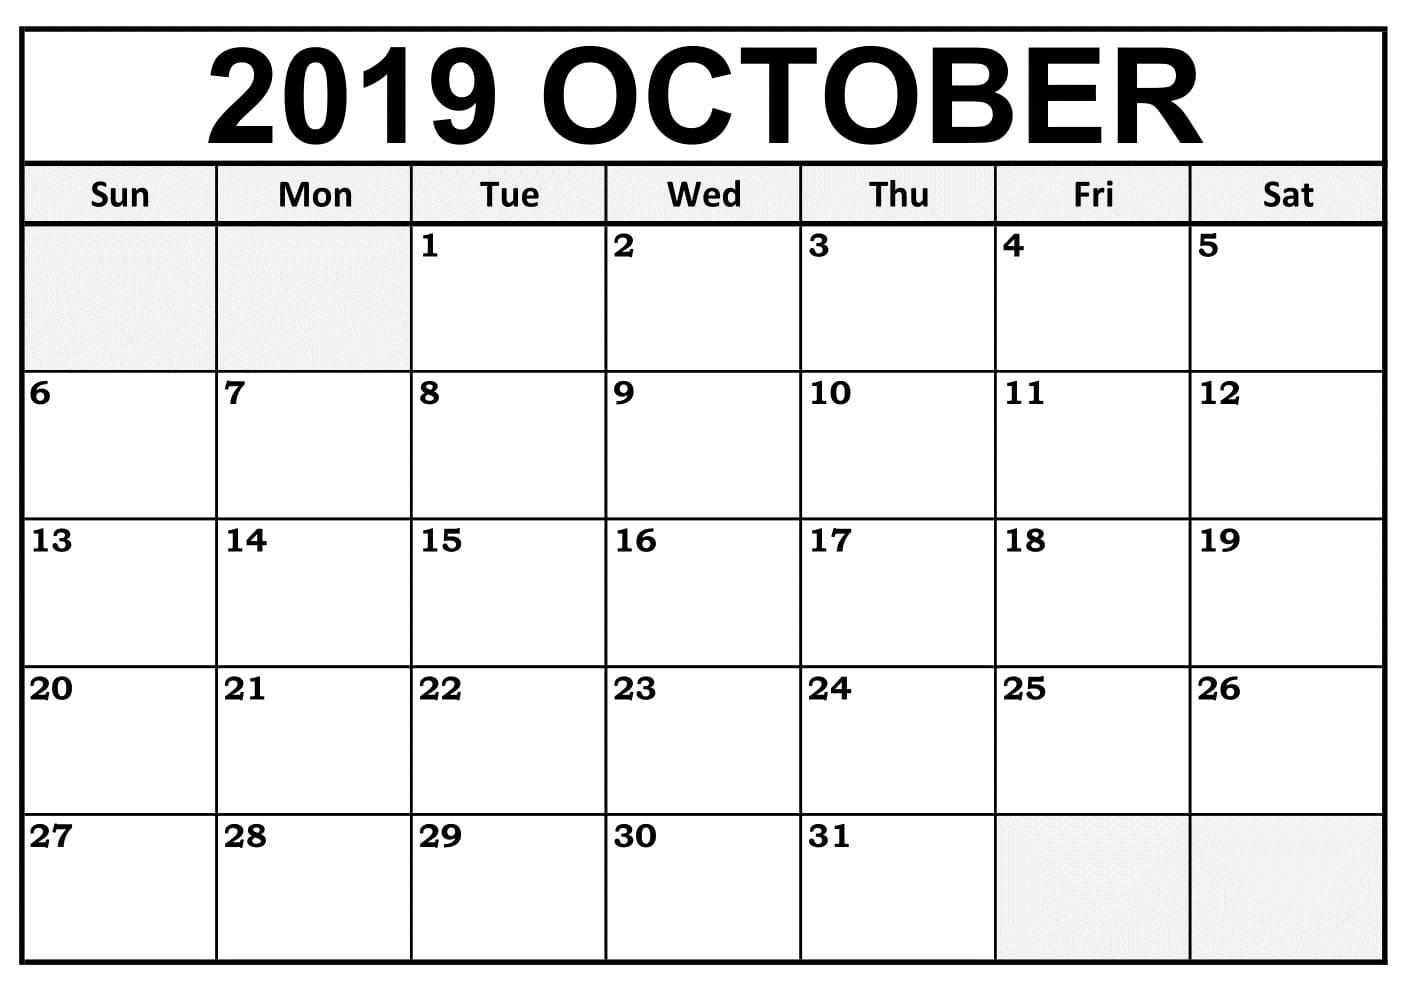 October 2019 Calendar Template Printable